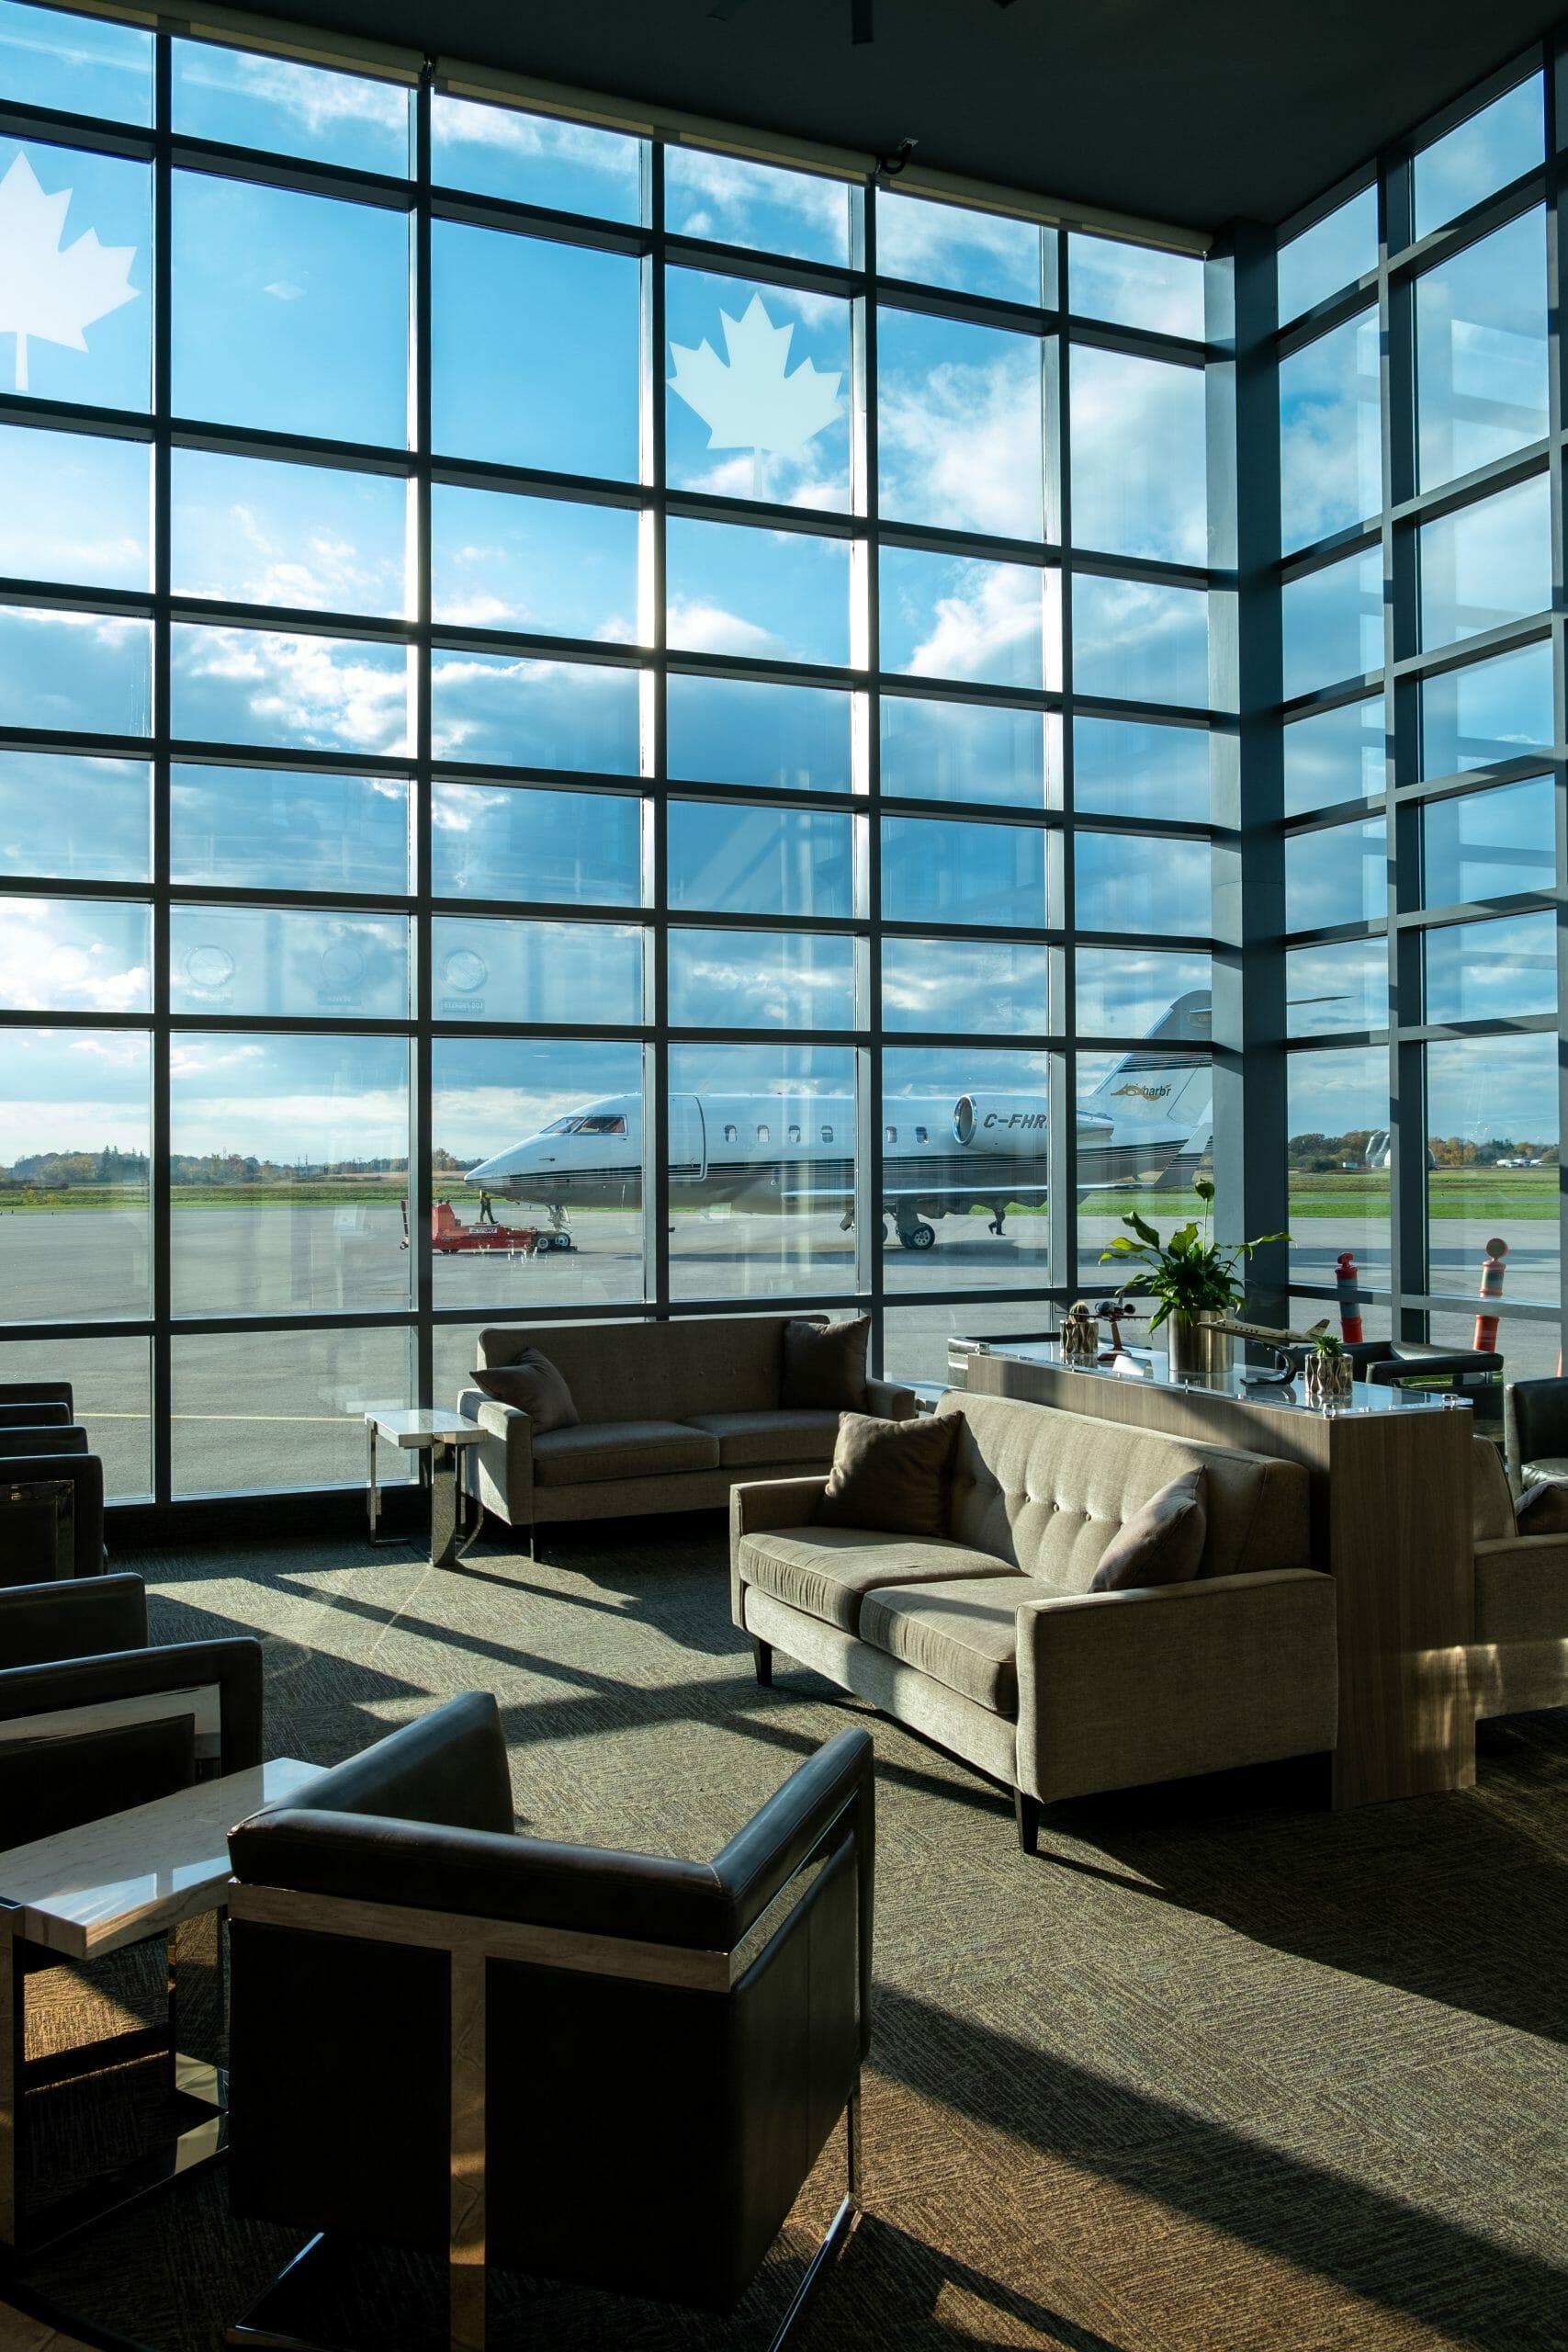 Inside the Jetport Passenger area.